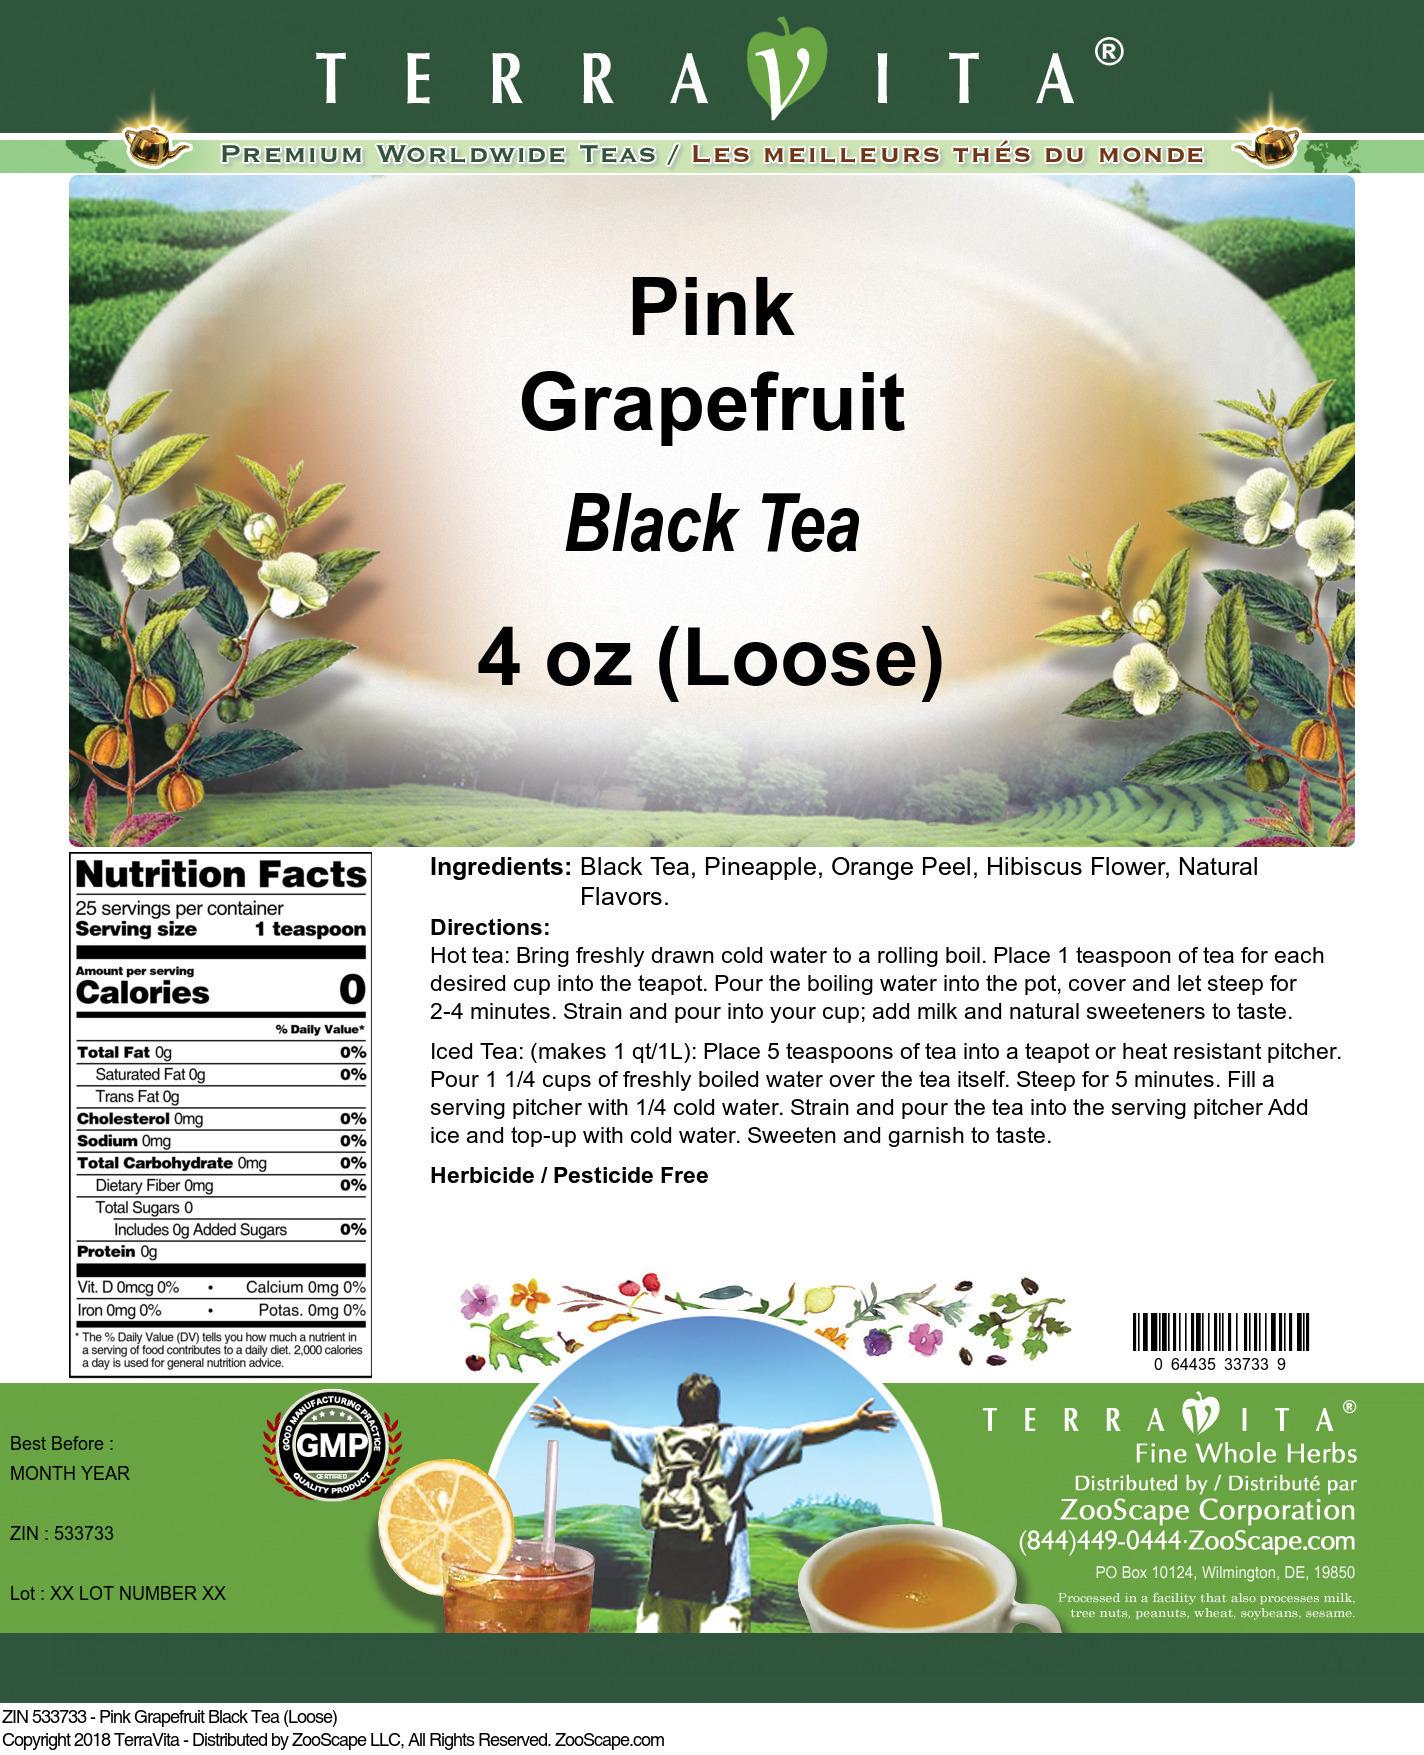 Pink Grapefruit Black Tea